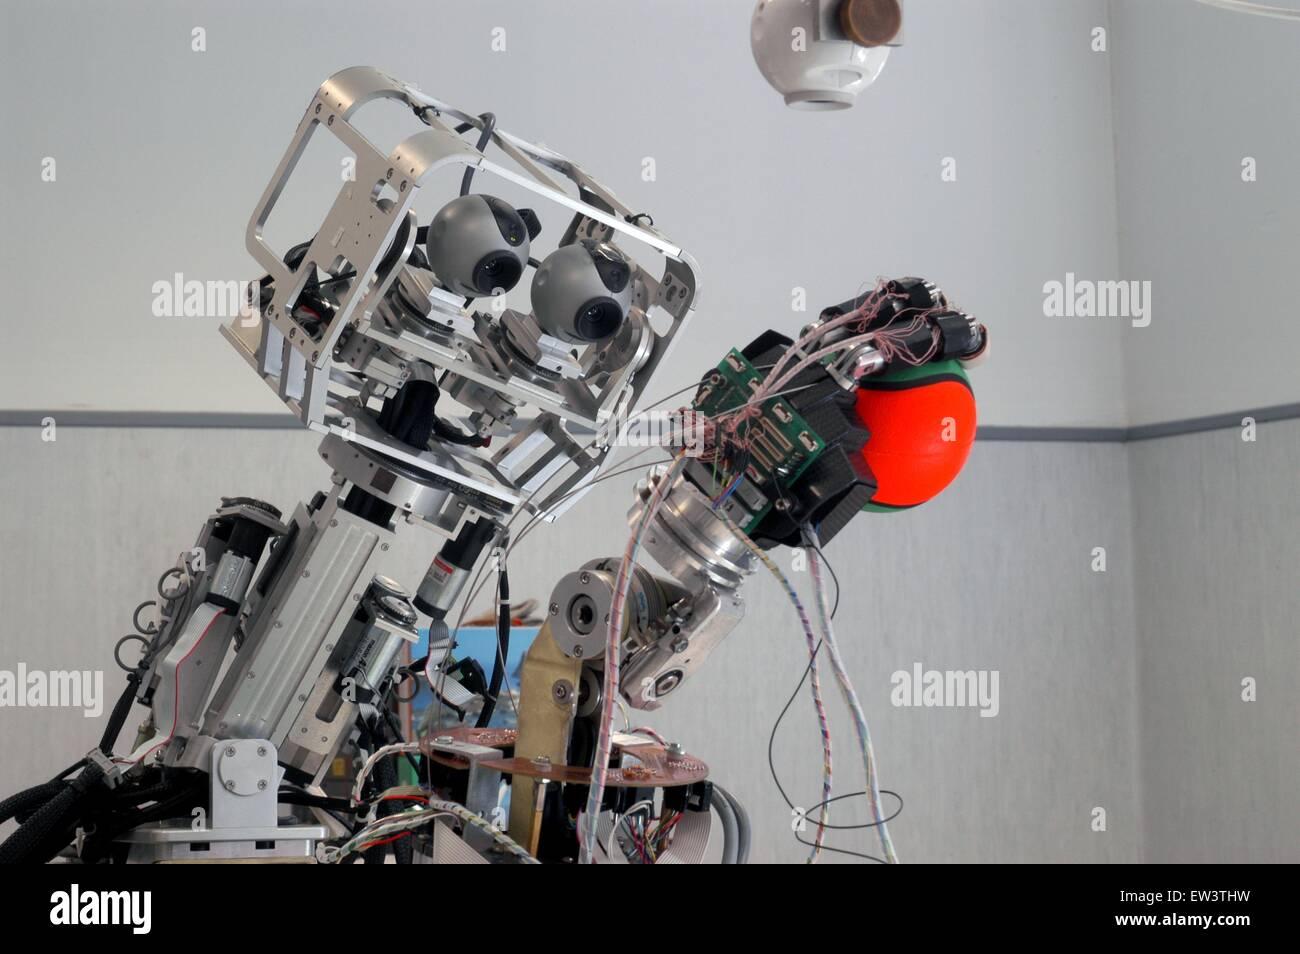 Advanced School St .Anna of Pisa, research center of Pontedera, Laboratory ARTS Lab (Advanced Robotics Technology) - Stock Image